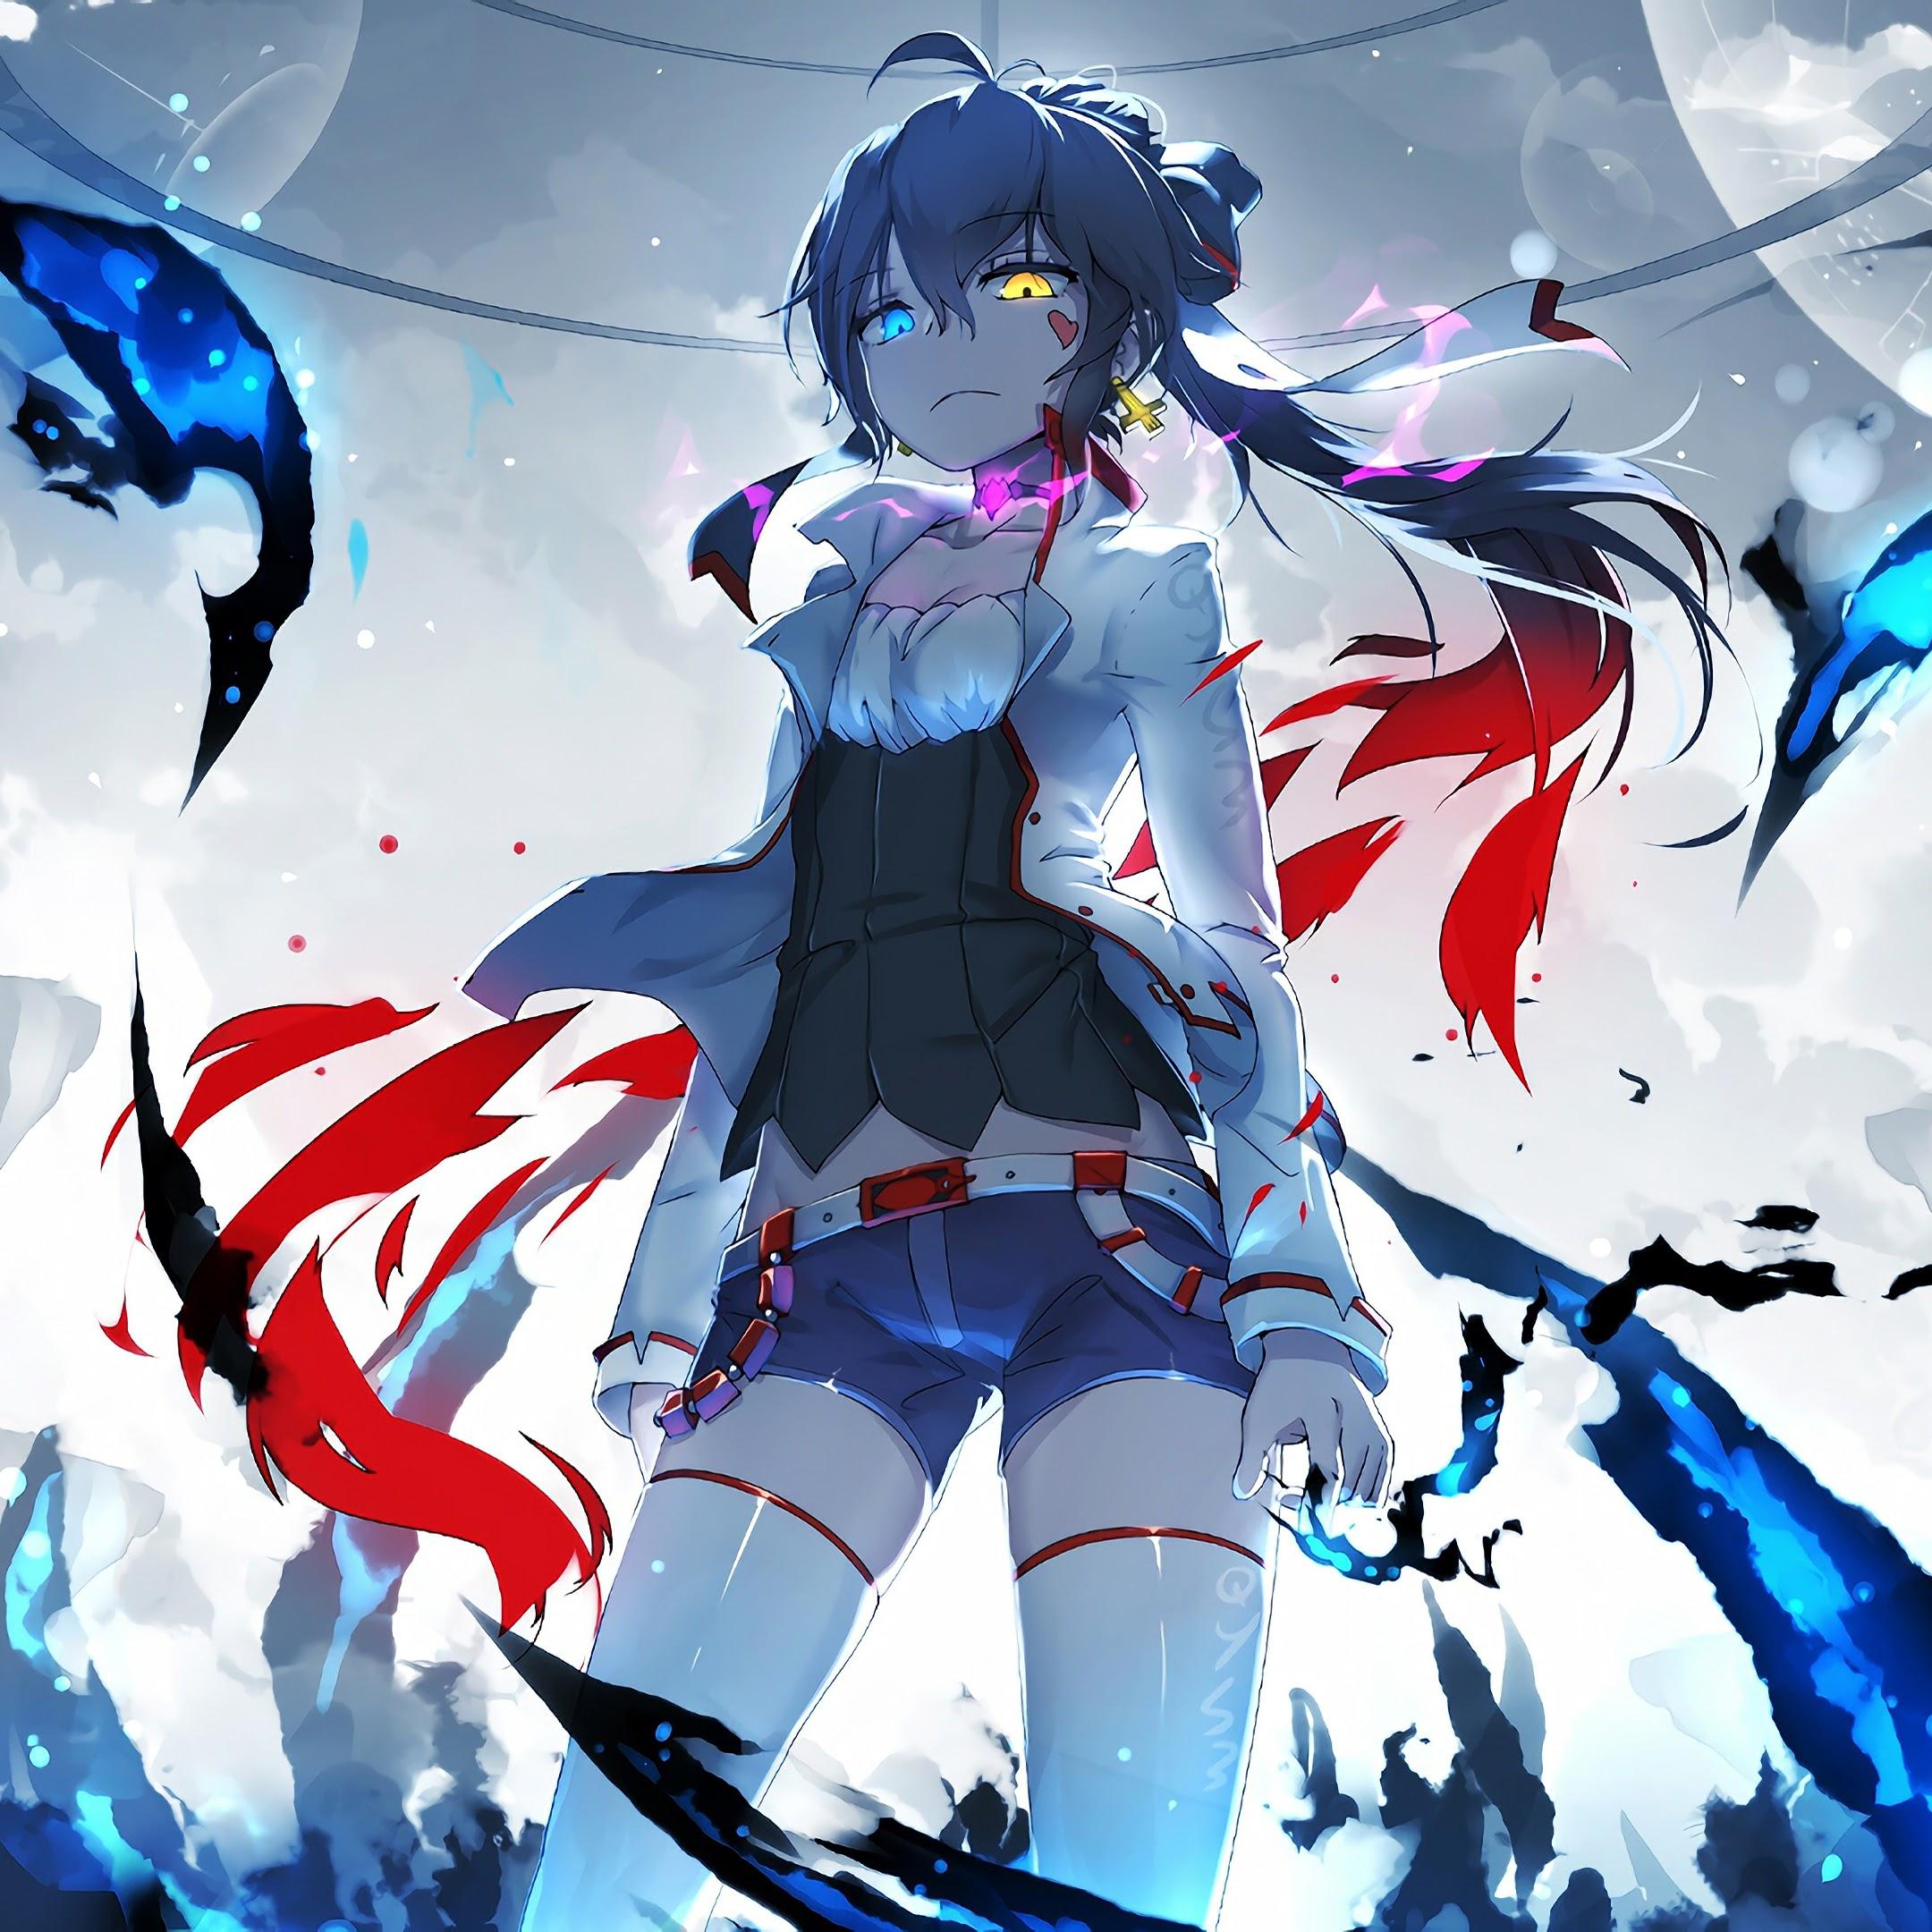 Anime, Girl, Pixiv Fantasia, Flaming, 4K, 3840x2160, #23 ...